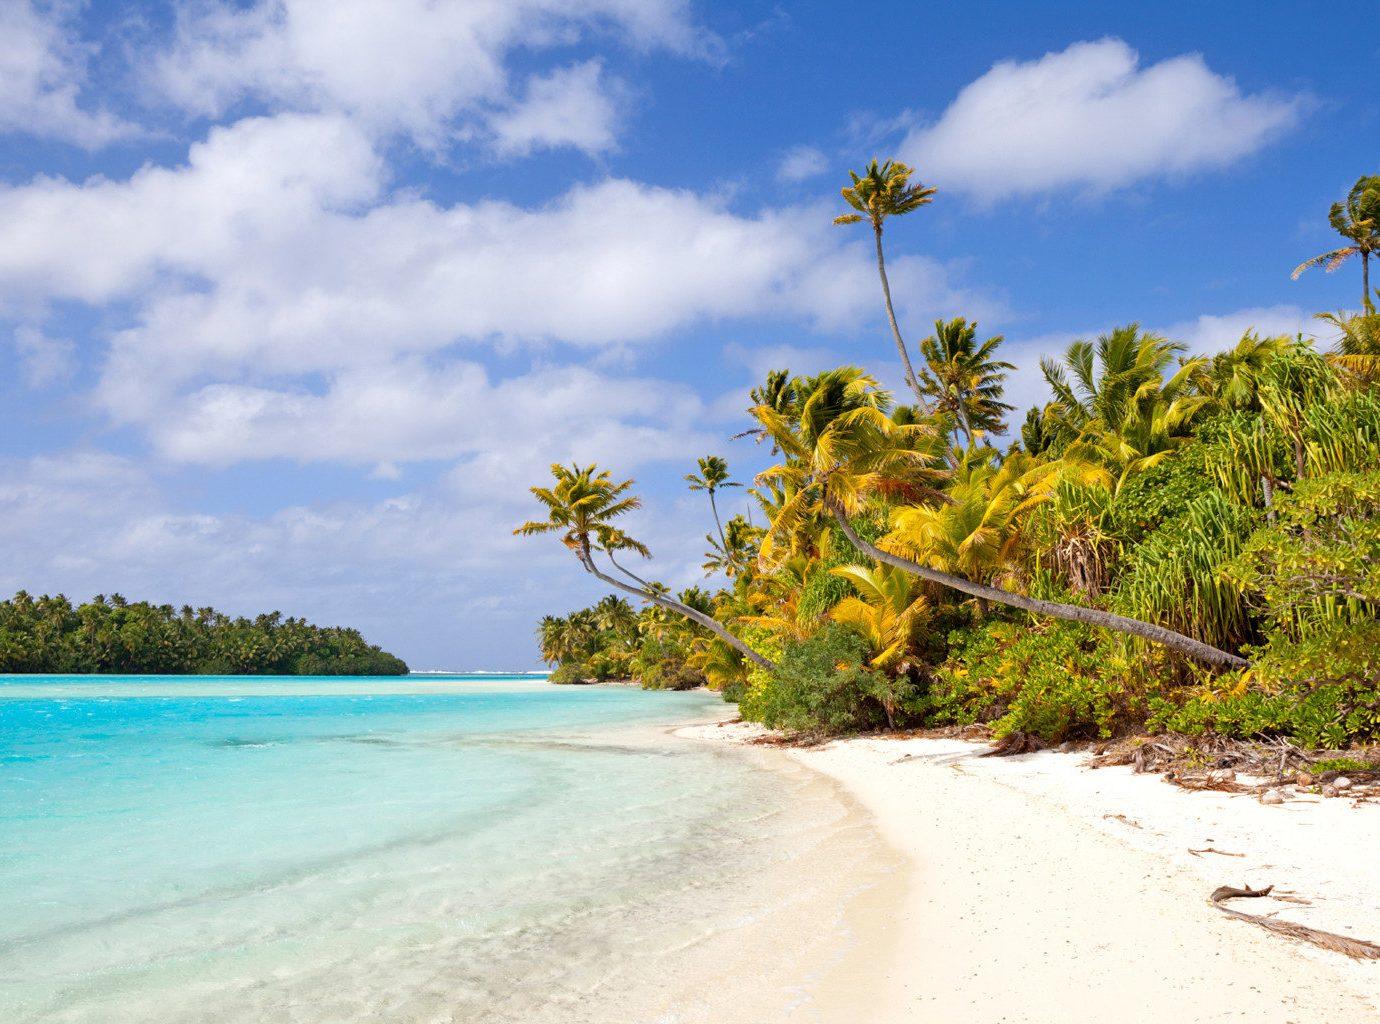 Trip Ideas sky outdoor tree Beach Nature landform shore body of water Sea Coast Ocean vacation caribbean tropics arecales Island bay sand flower Lagoon blue sandy day